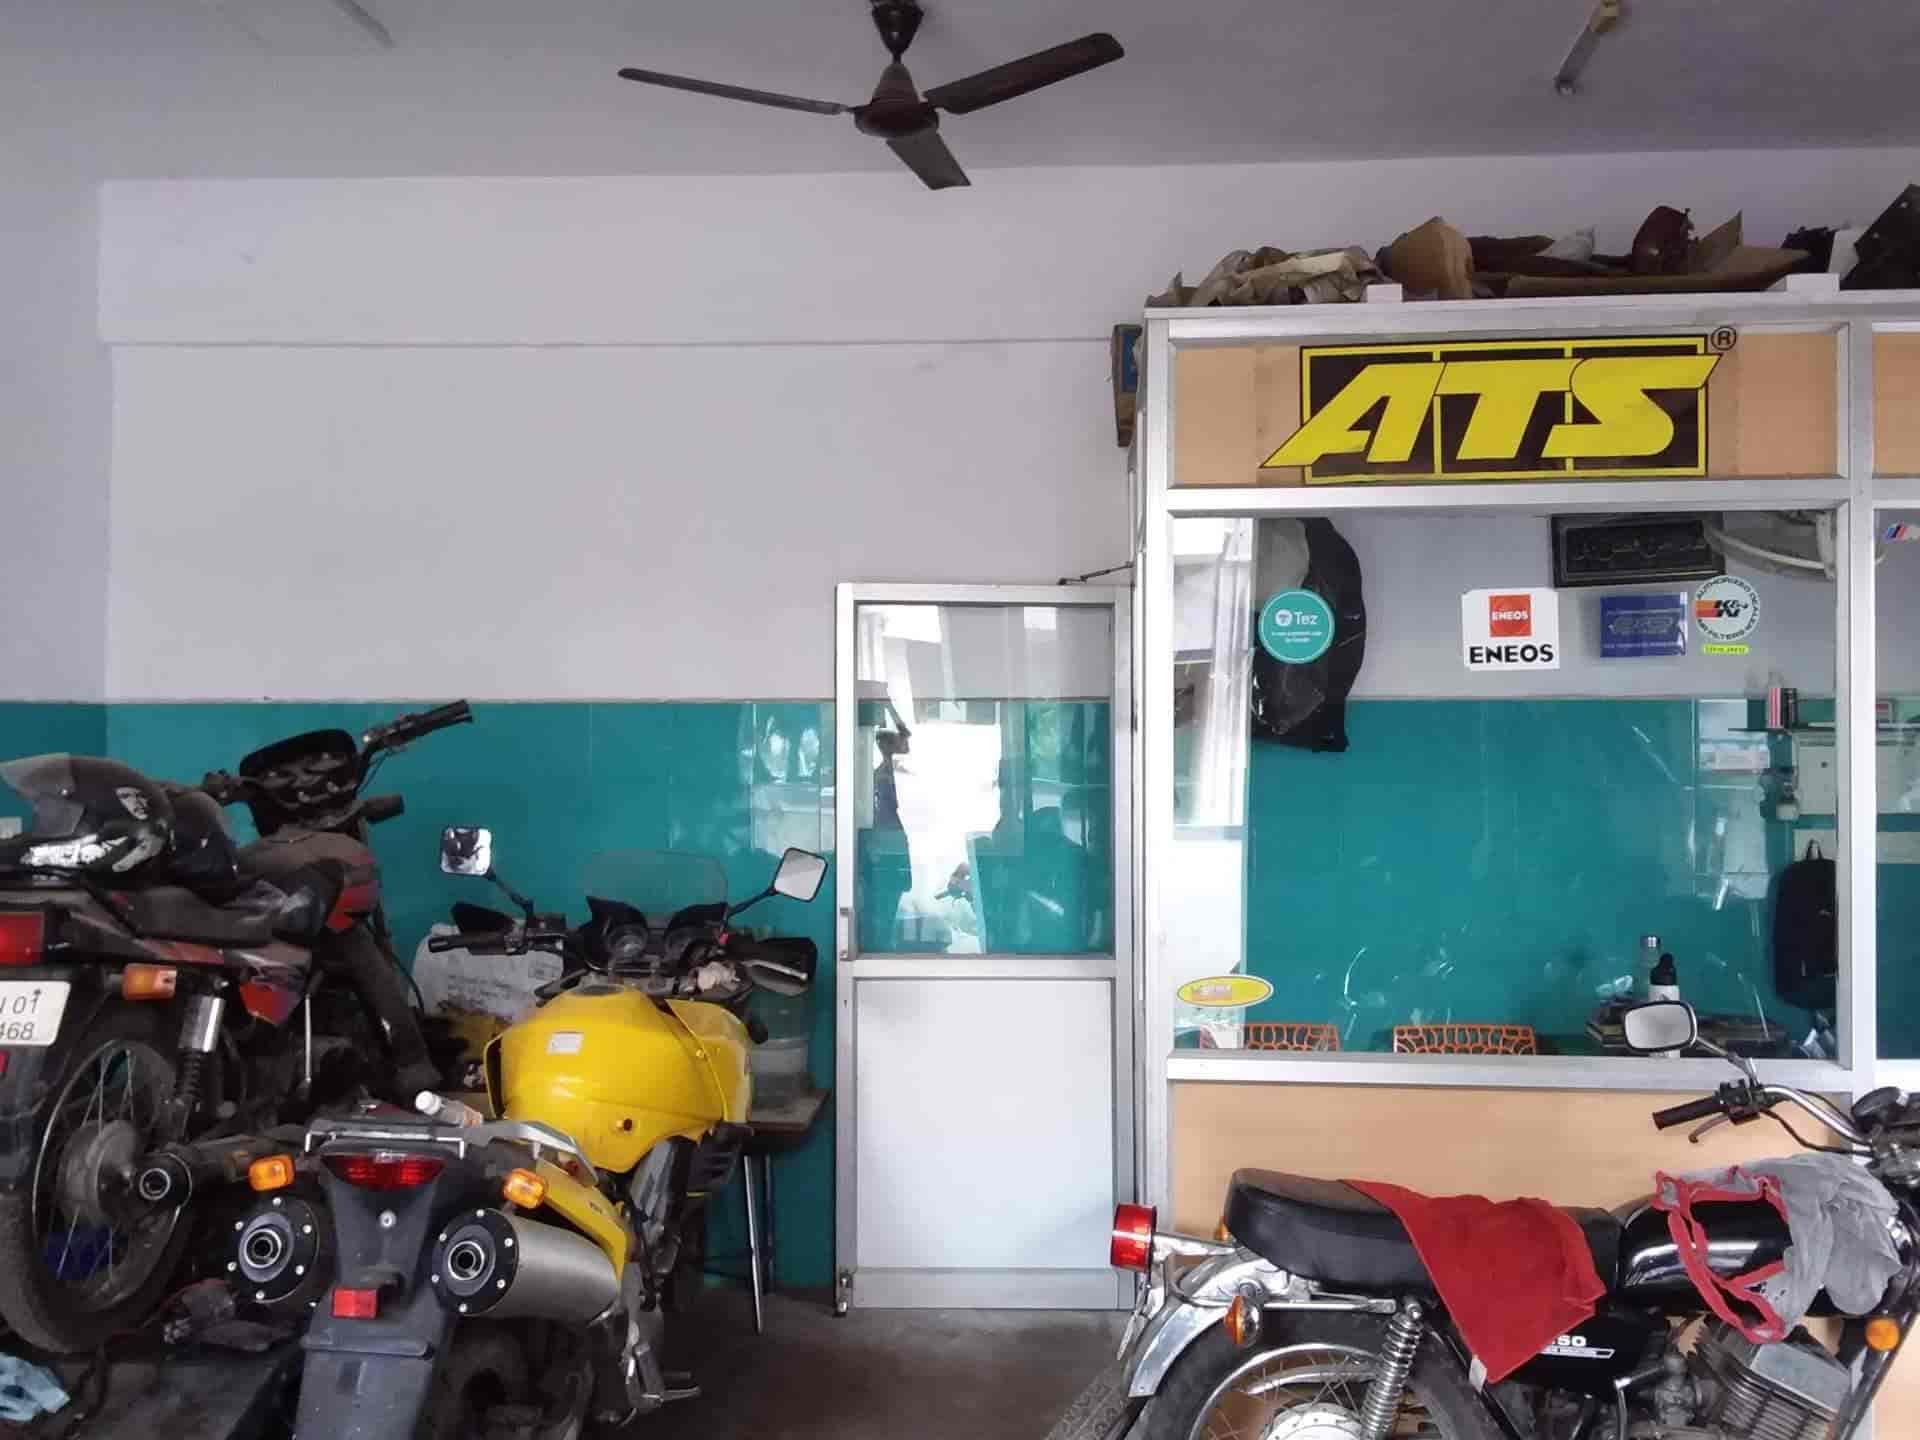 Classic Bikes, Arumbakkam - Motorcycle Repair & Services in